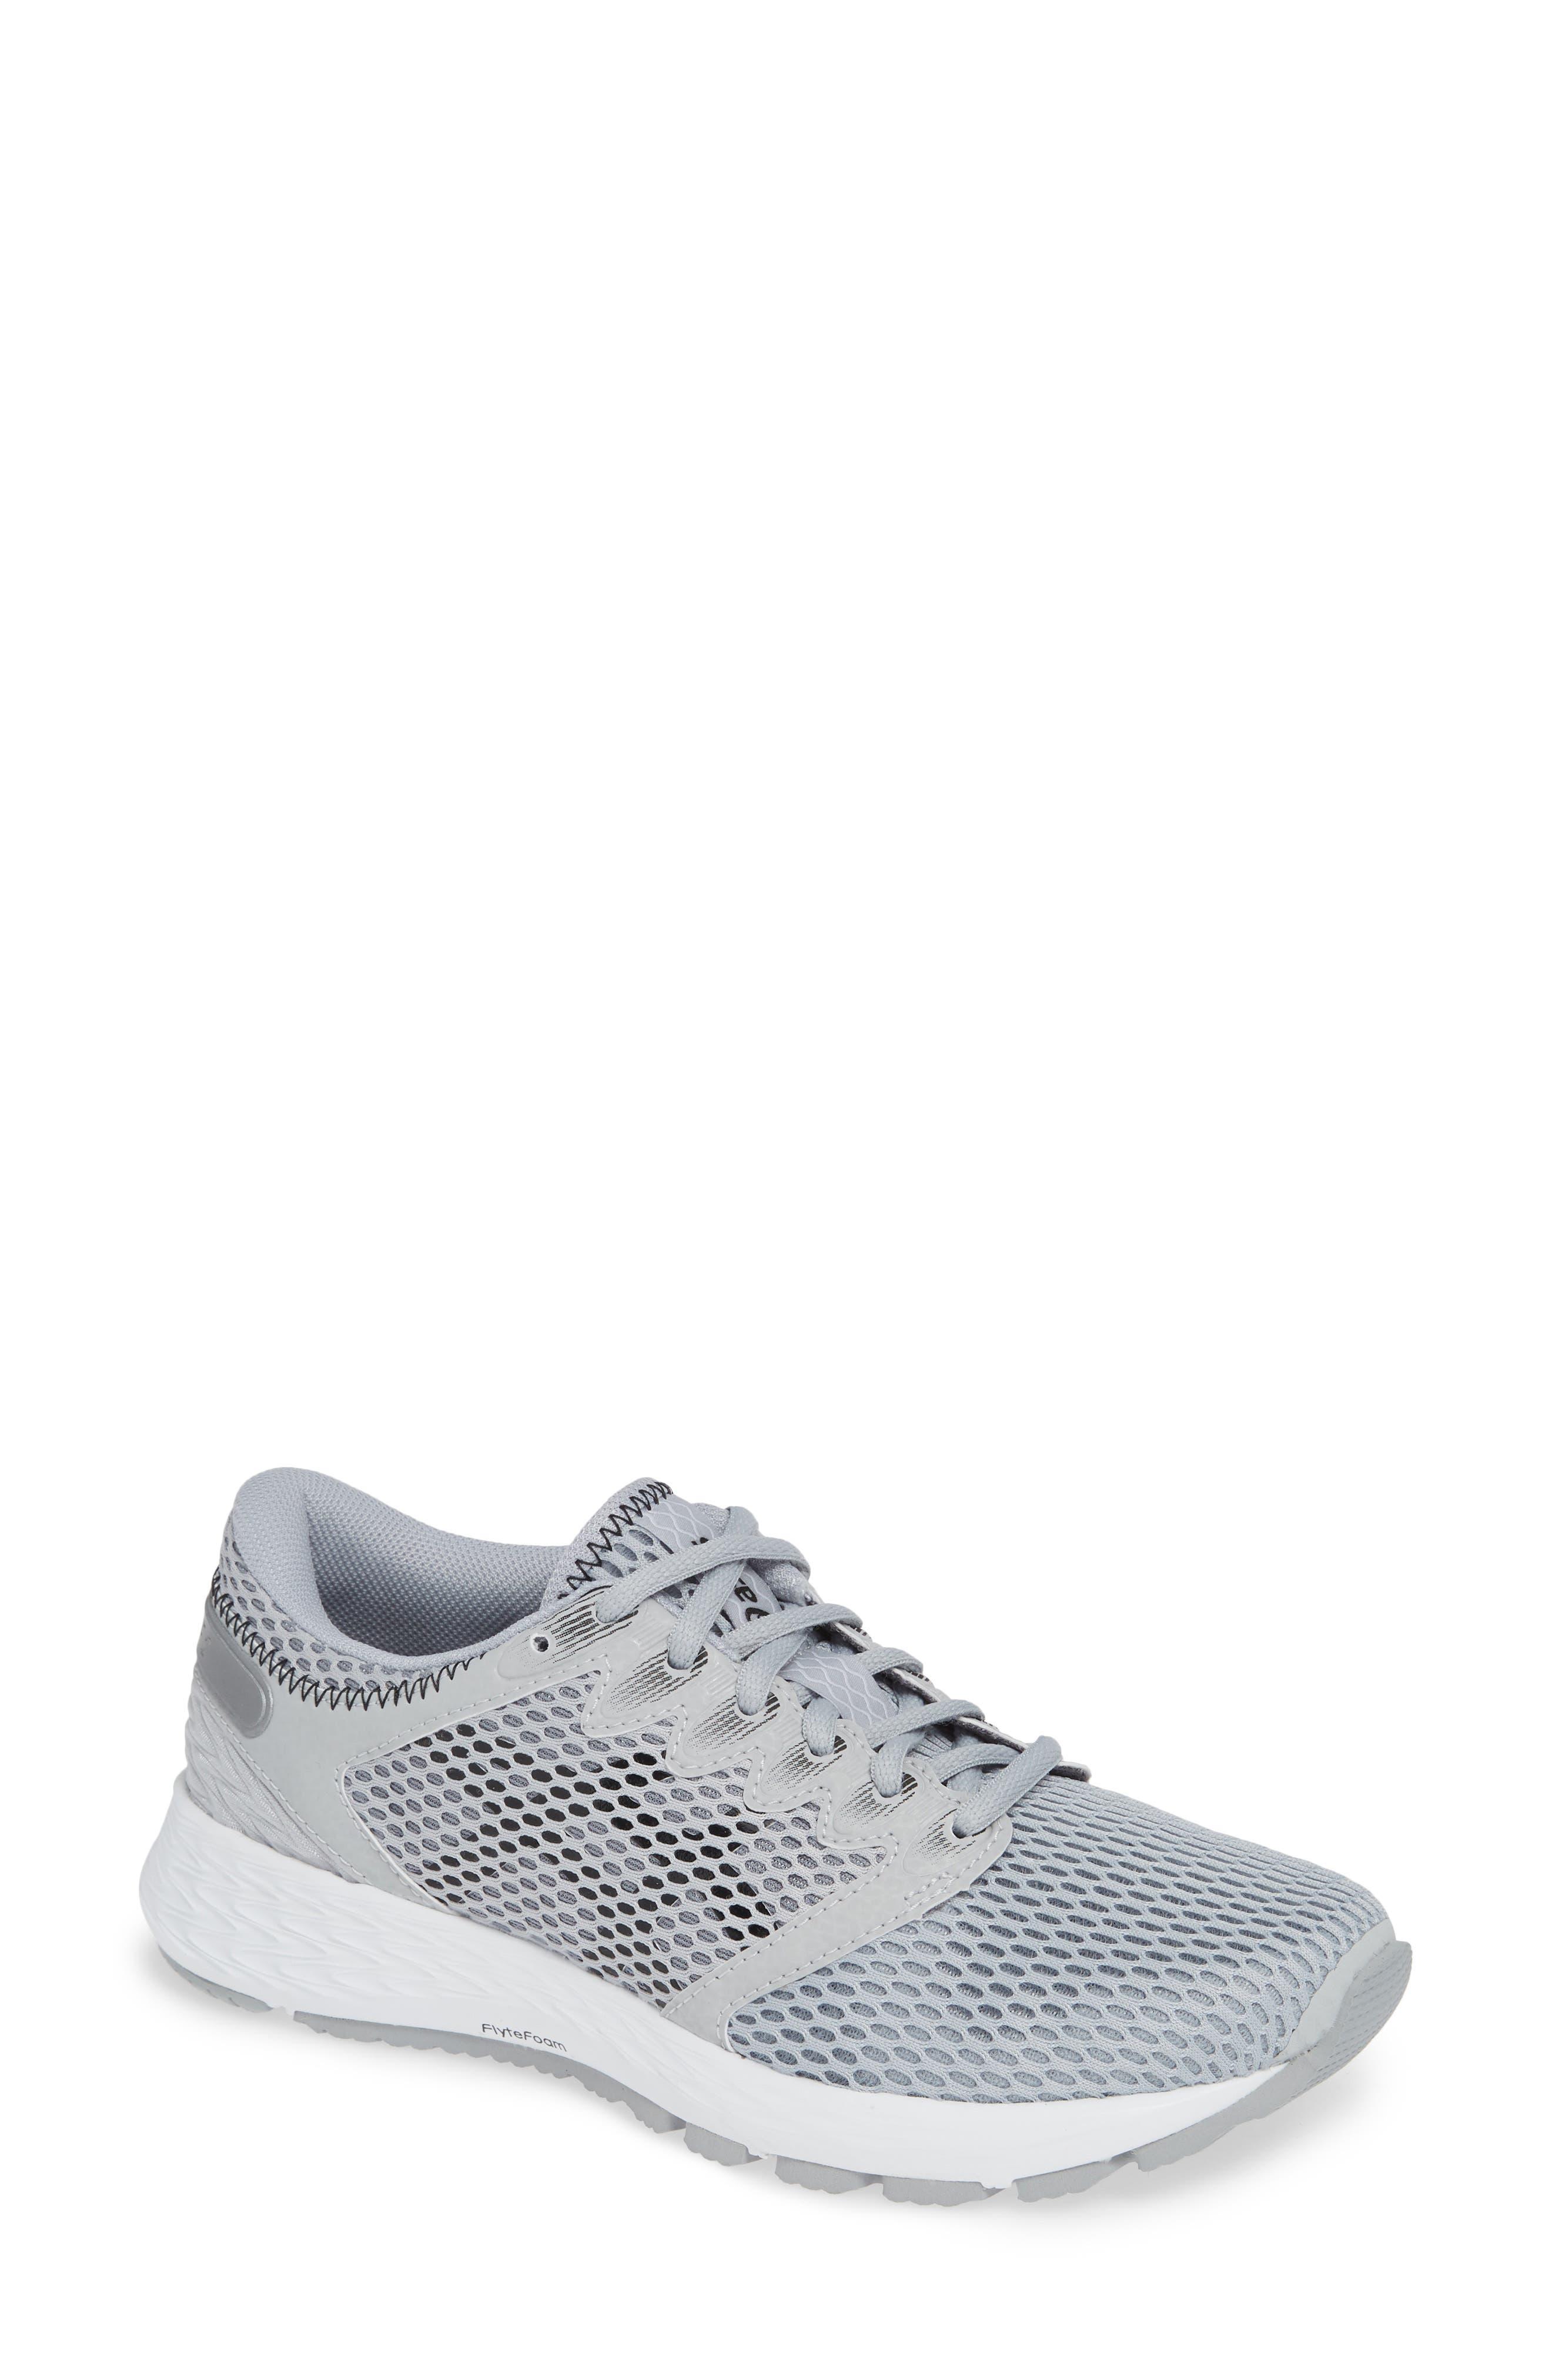 Asics Roadhawk Ff 2 Running Shoe, Grey